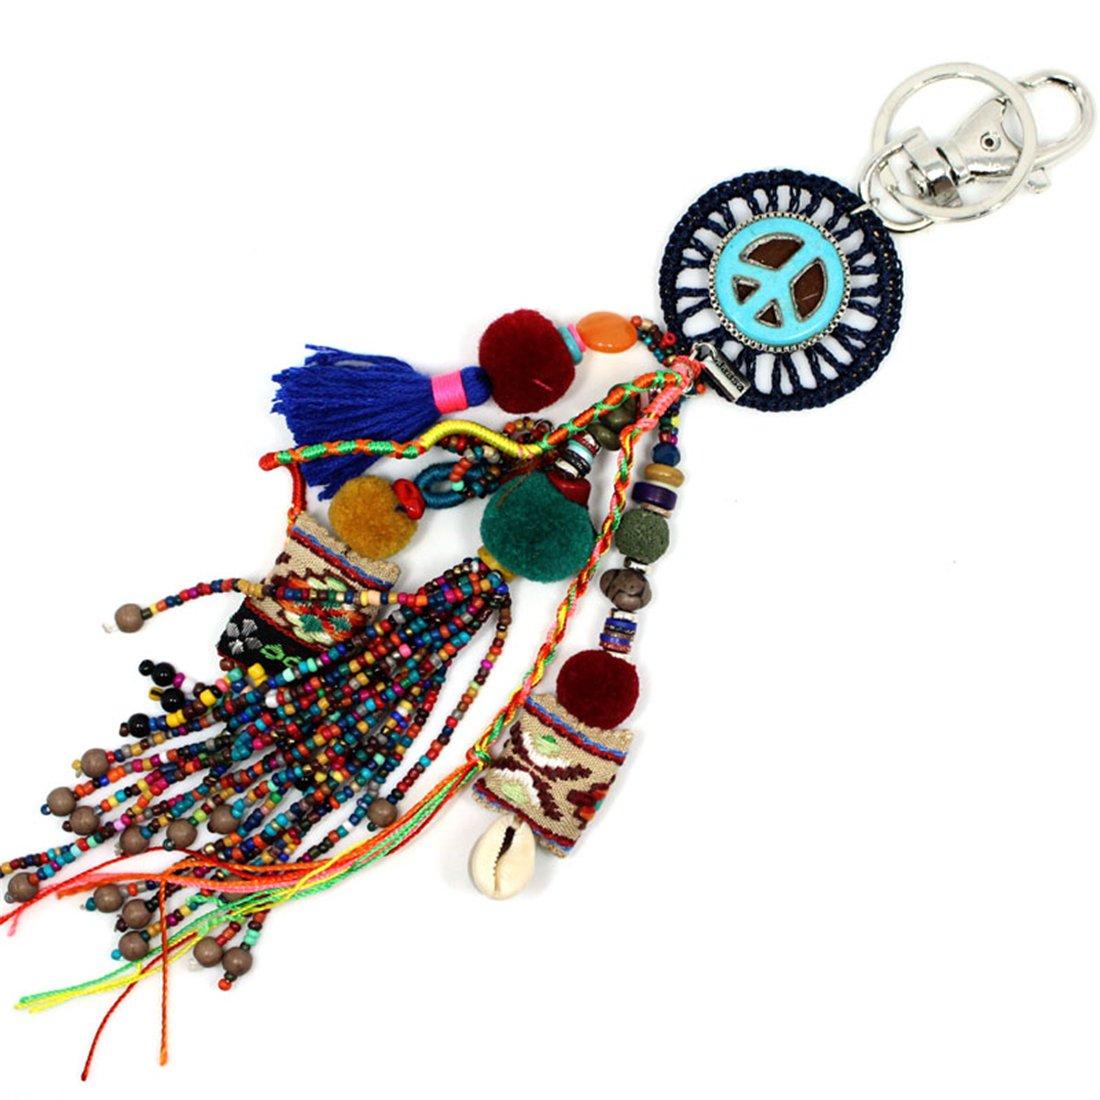 JAASA Handmade jewelry Keychain Peace Mark Seed Beads Pendant Charm Key Chains Bohemian Accessories Gift for Women Girl